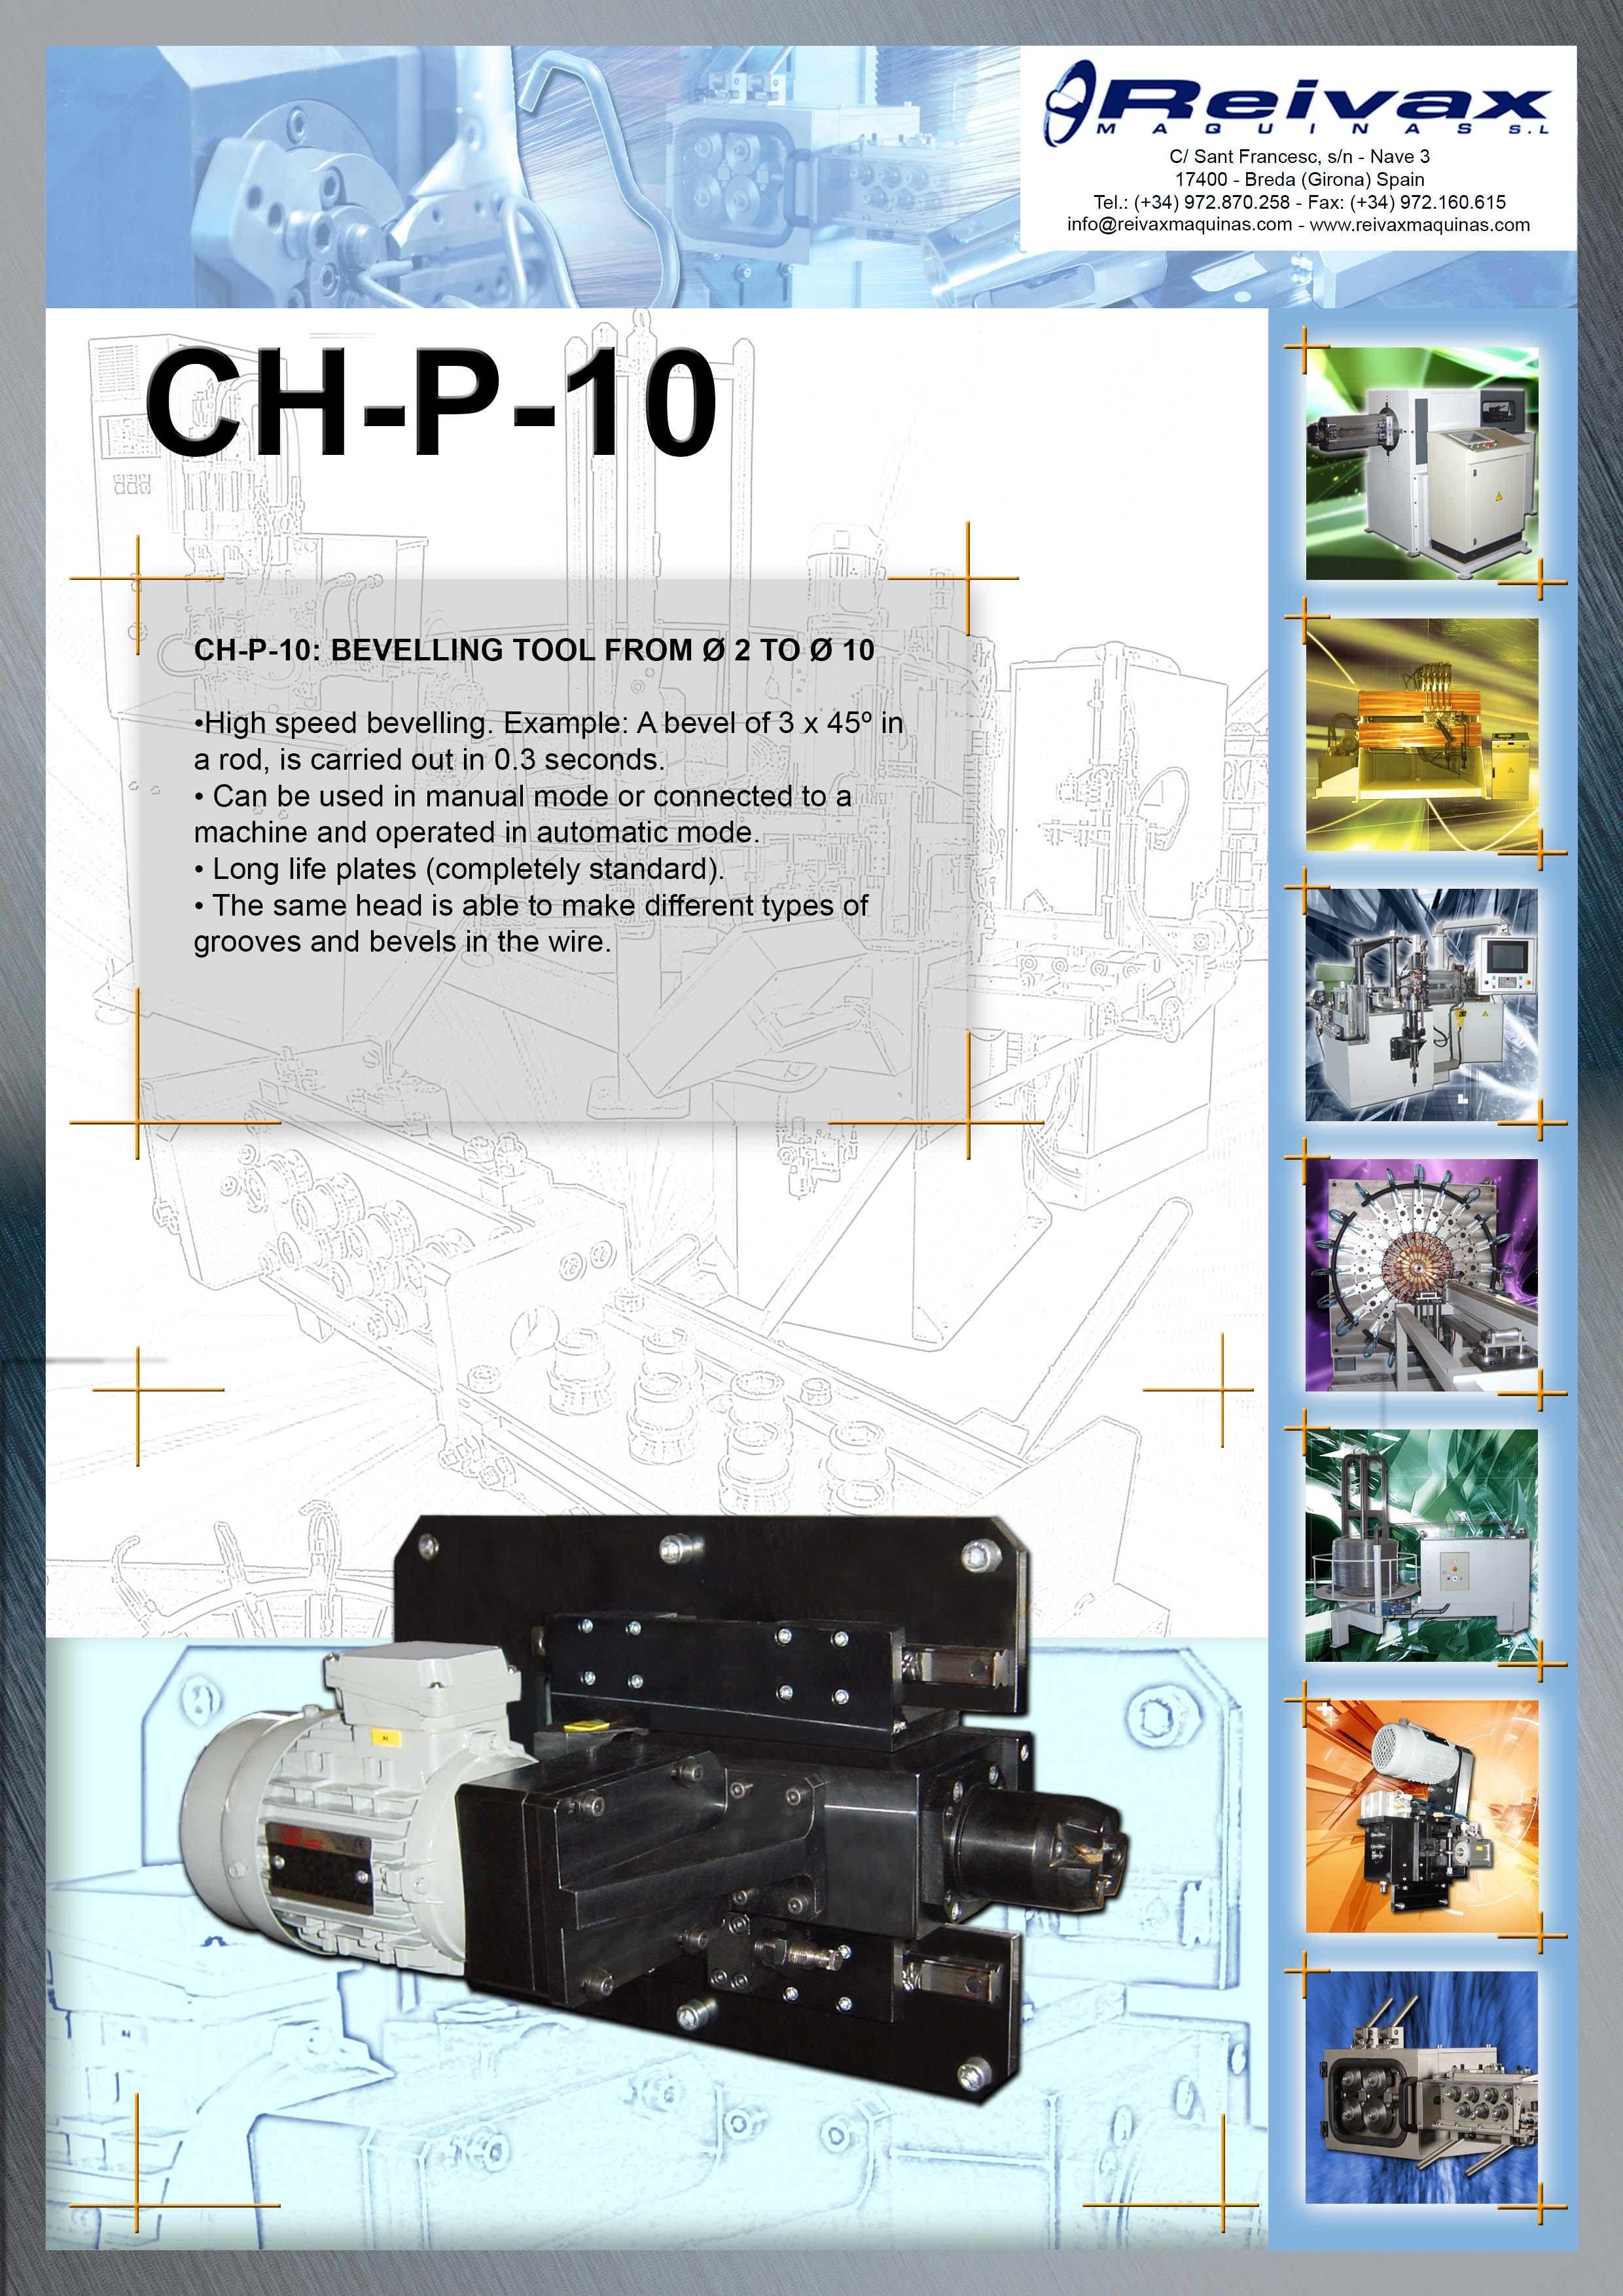 ReivaxMaquinas: Technical Details CH-P-10